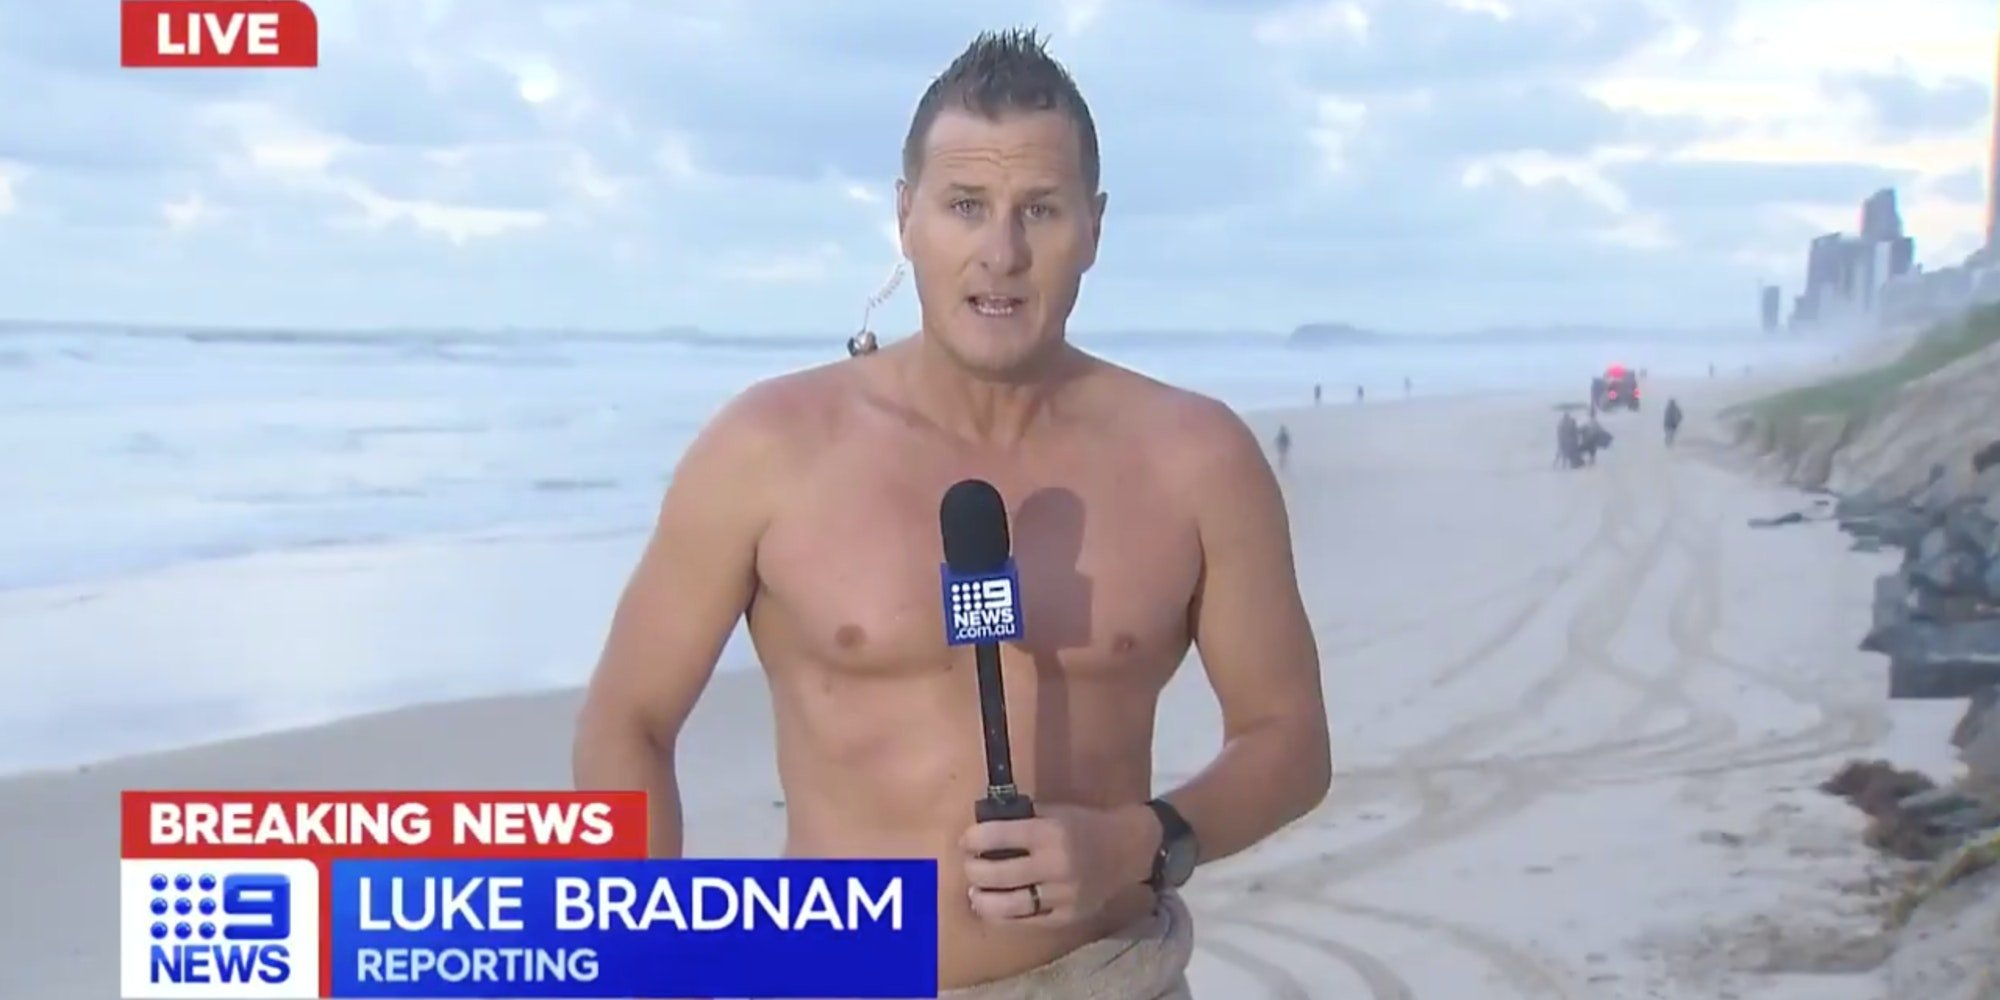 weatherman luke bradnam during live report